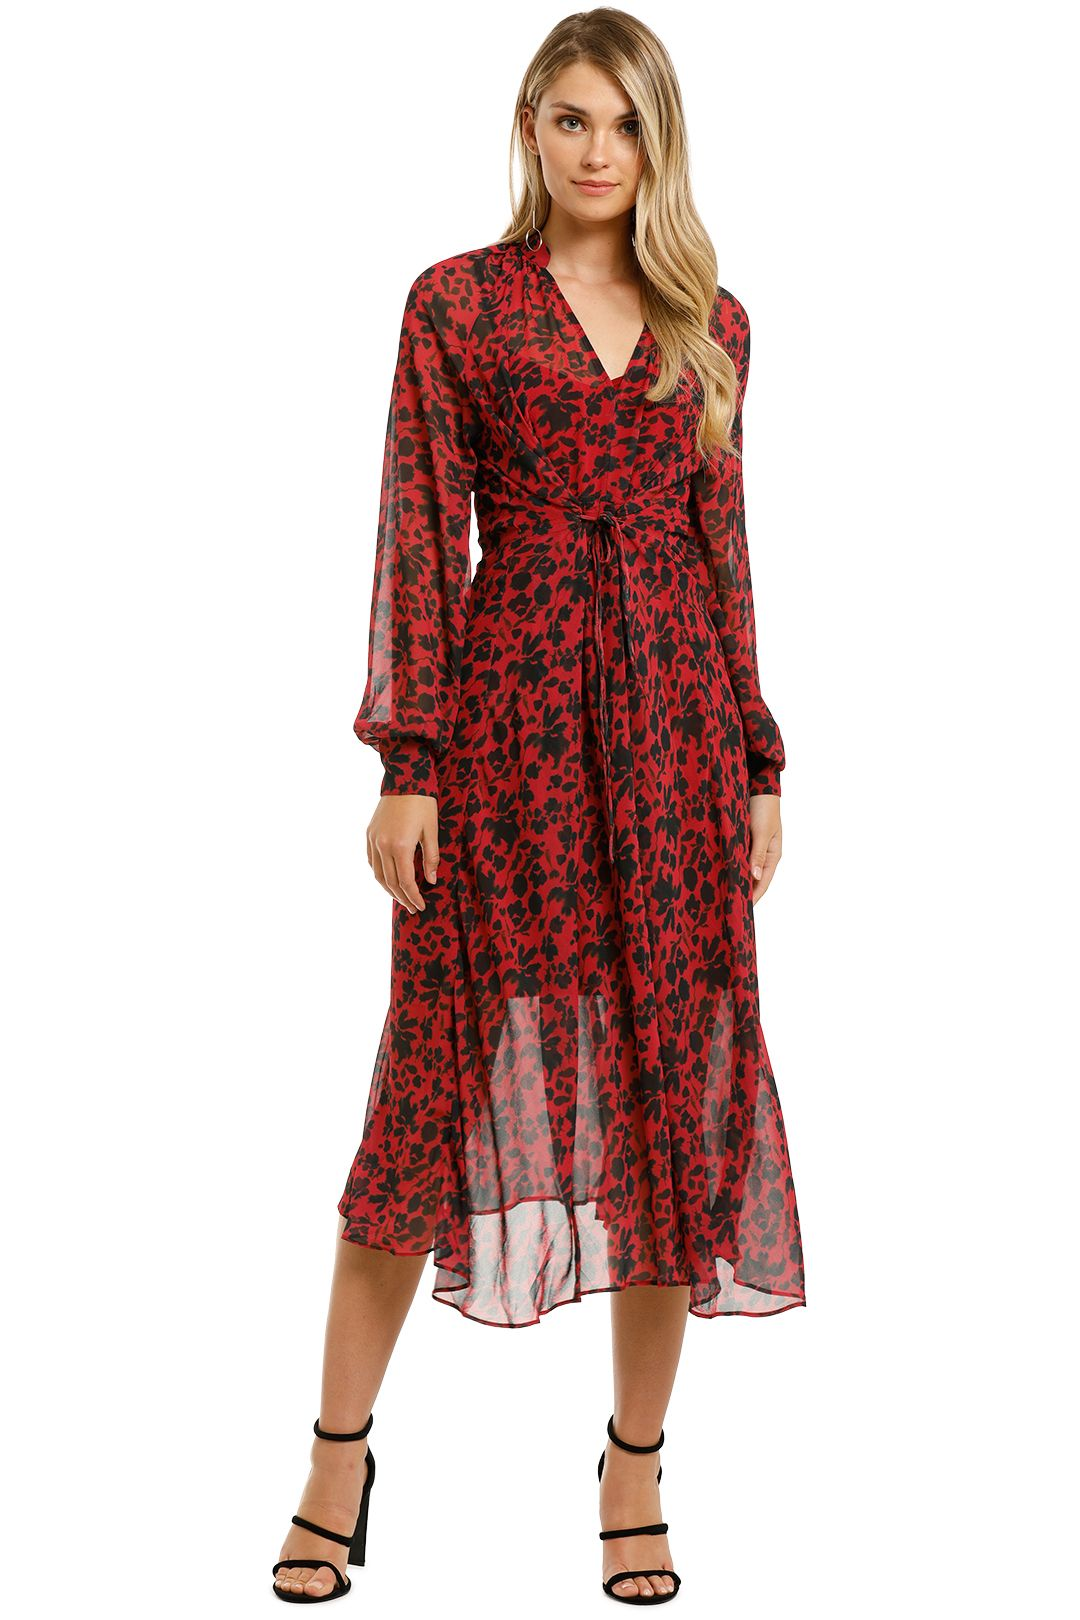 Cooper-St-Badlands-Long-Sleeve-Midi-Dress-Red-Animal-Front